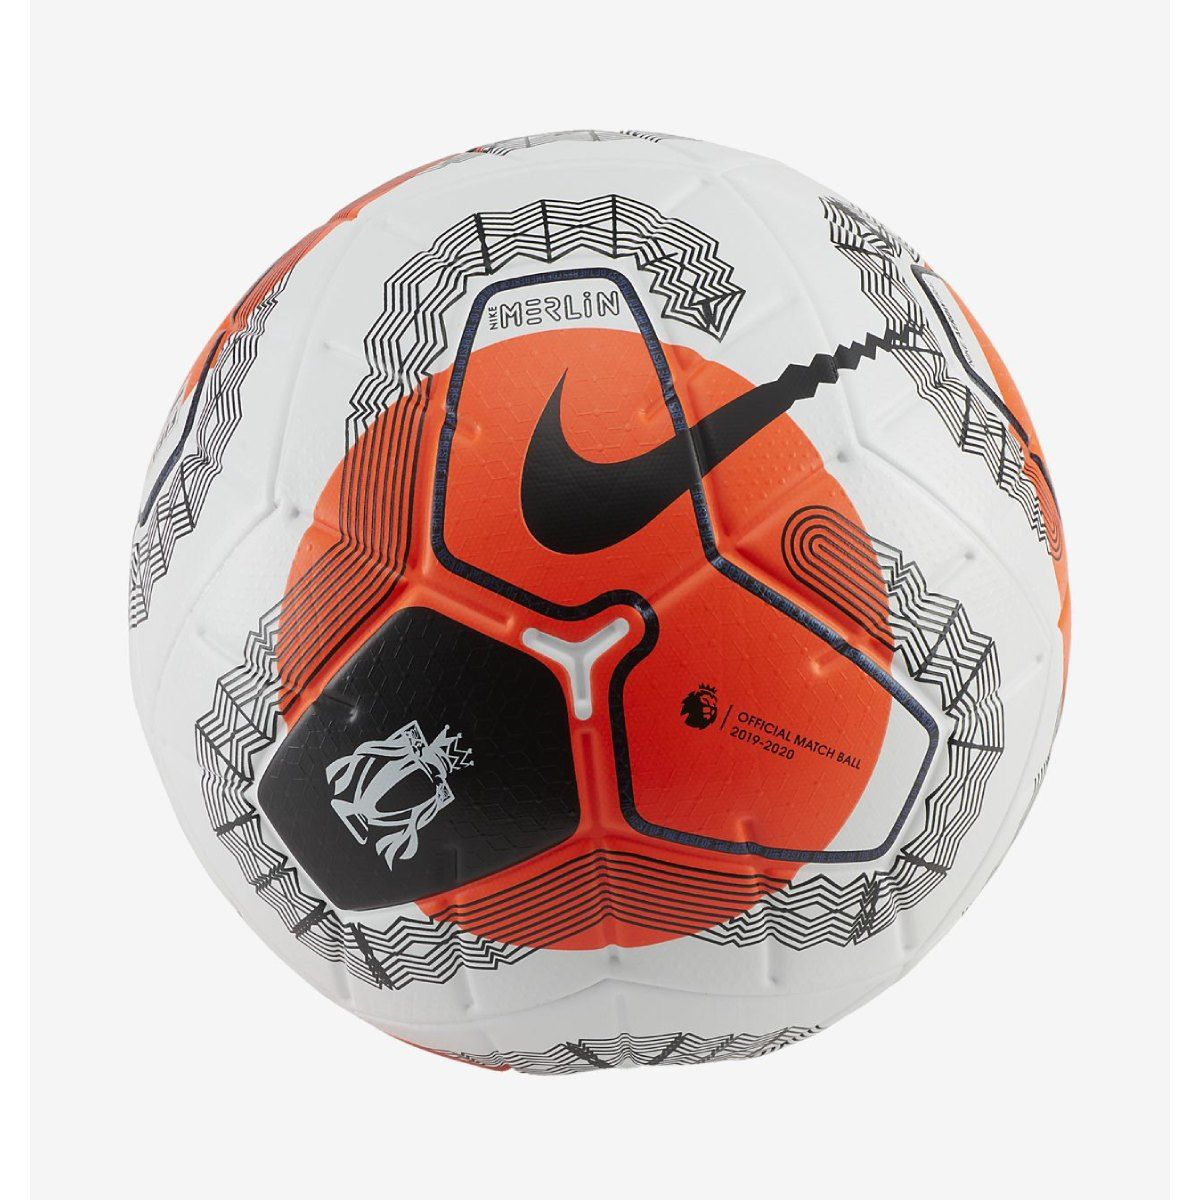 Nike Premier League Tunnel Vision Merlin White Hyper Crimson Black In 2020 Premier League League Football Trainer